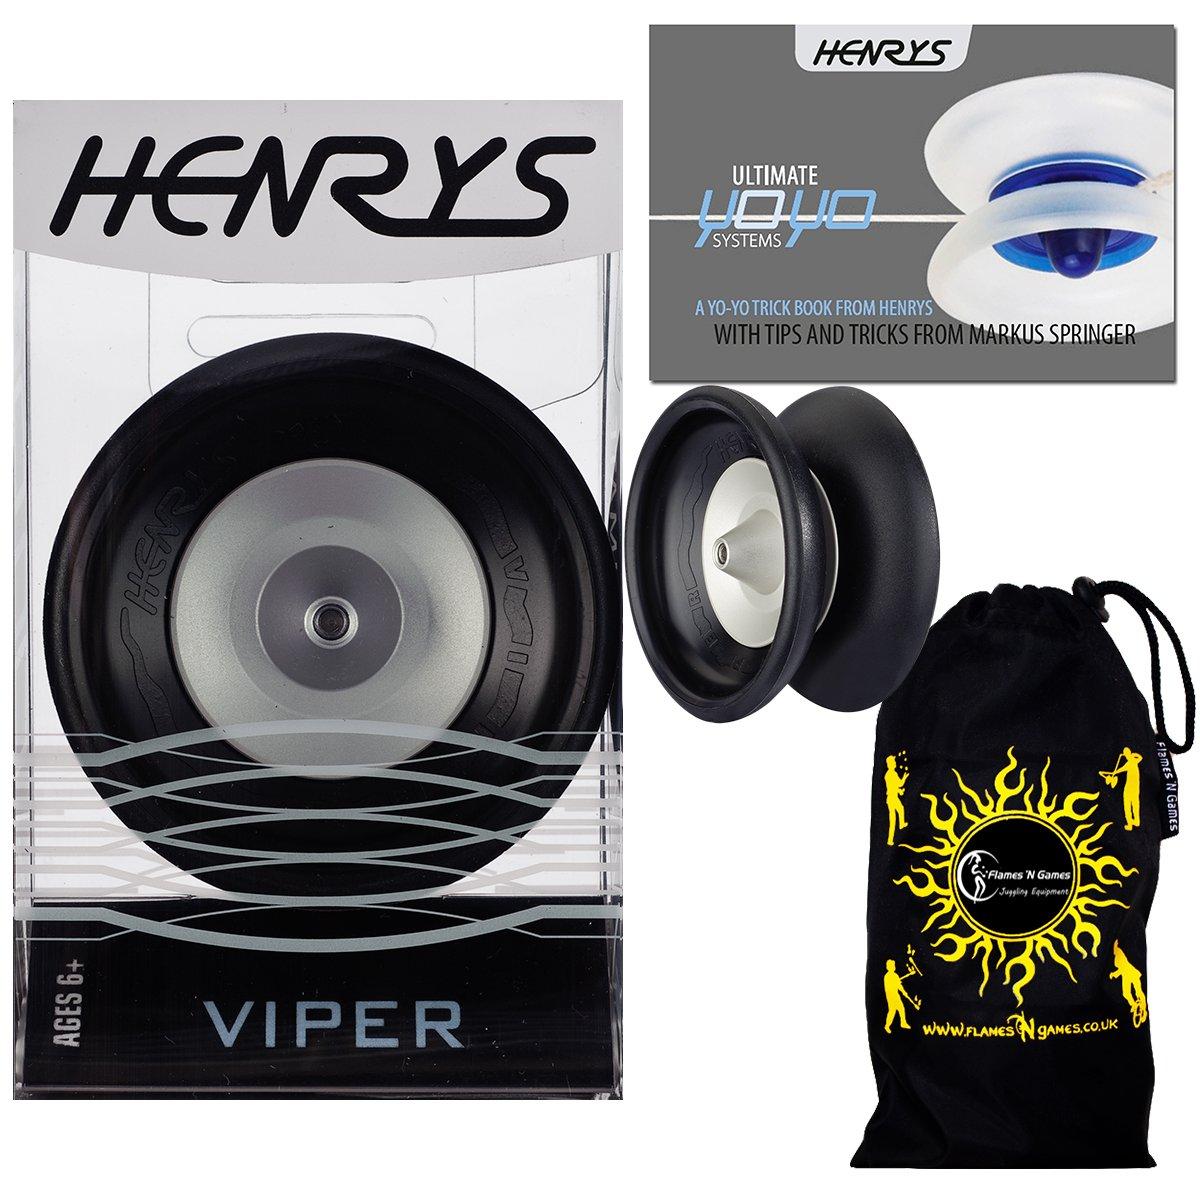 Henrys VIPER YoYo (Black) Professional Ball Bearing YoYo